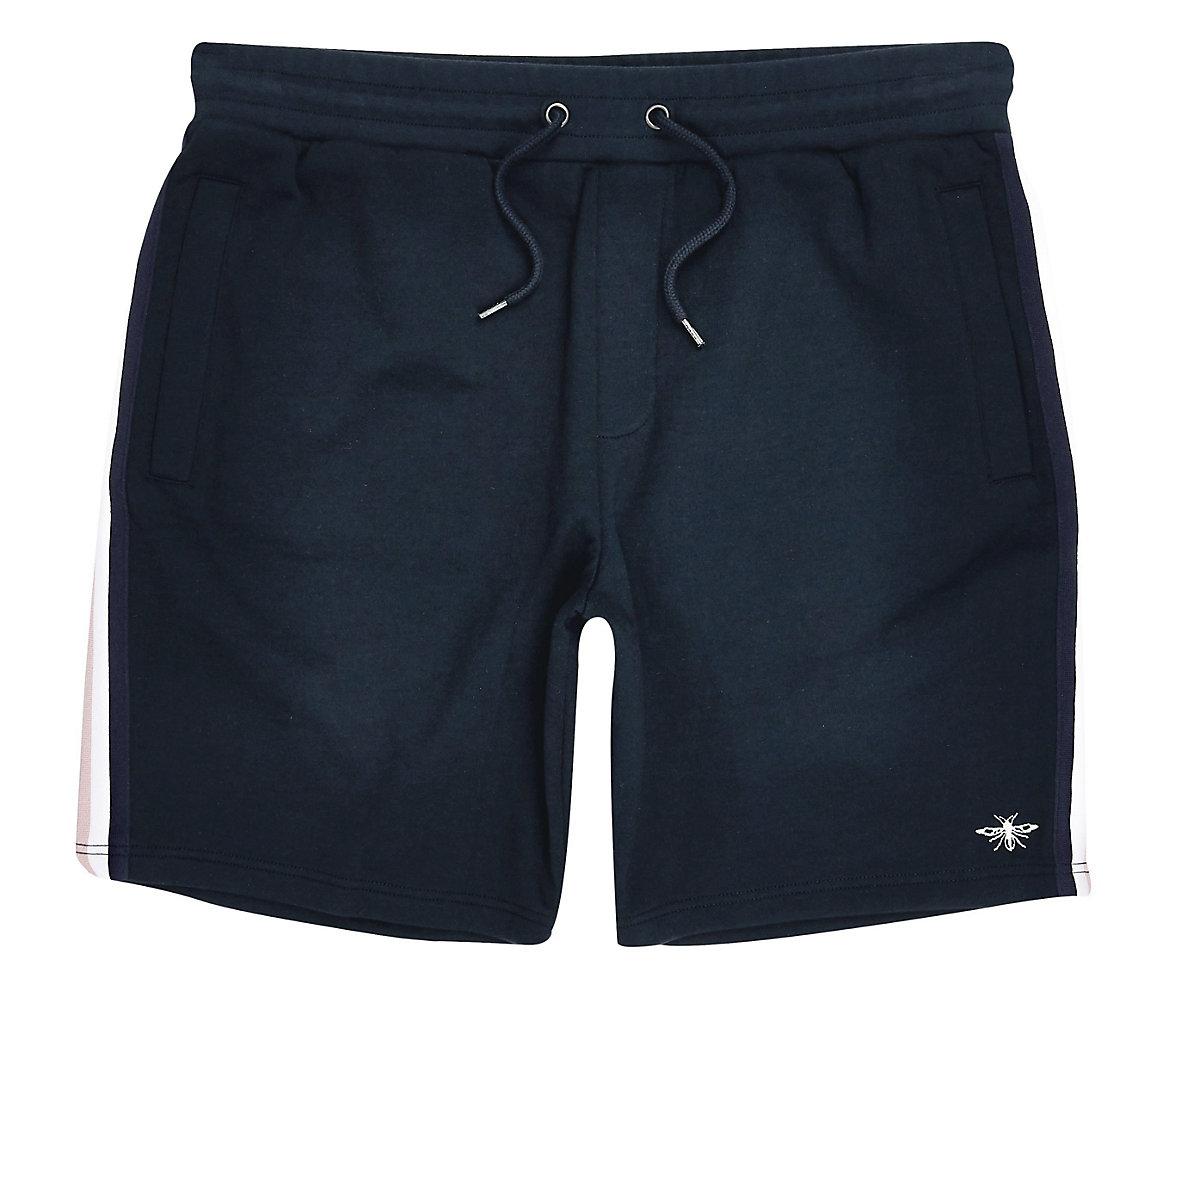 Big and Tall navy tape shorts